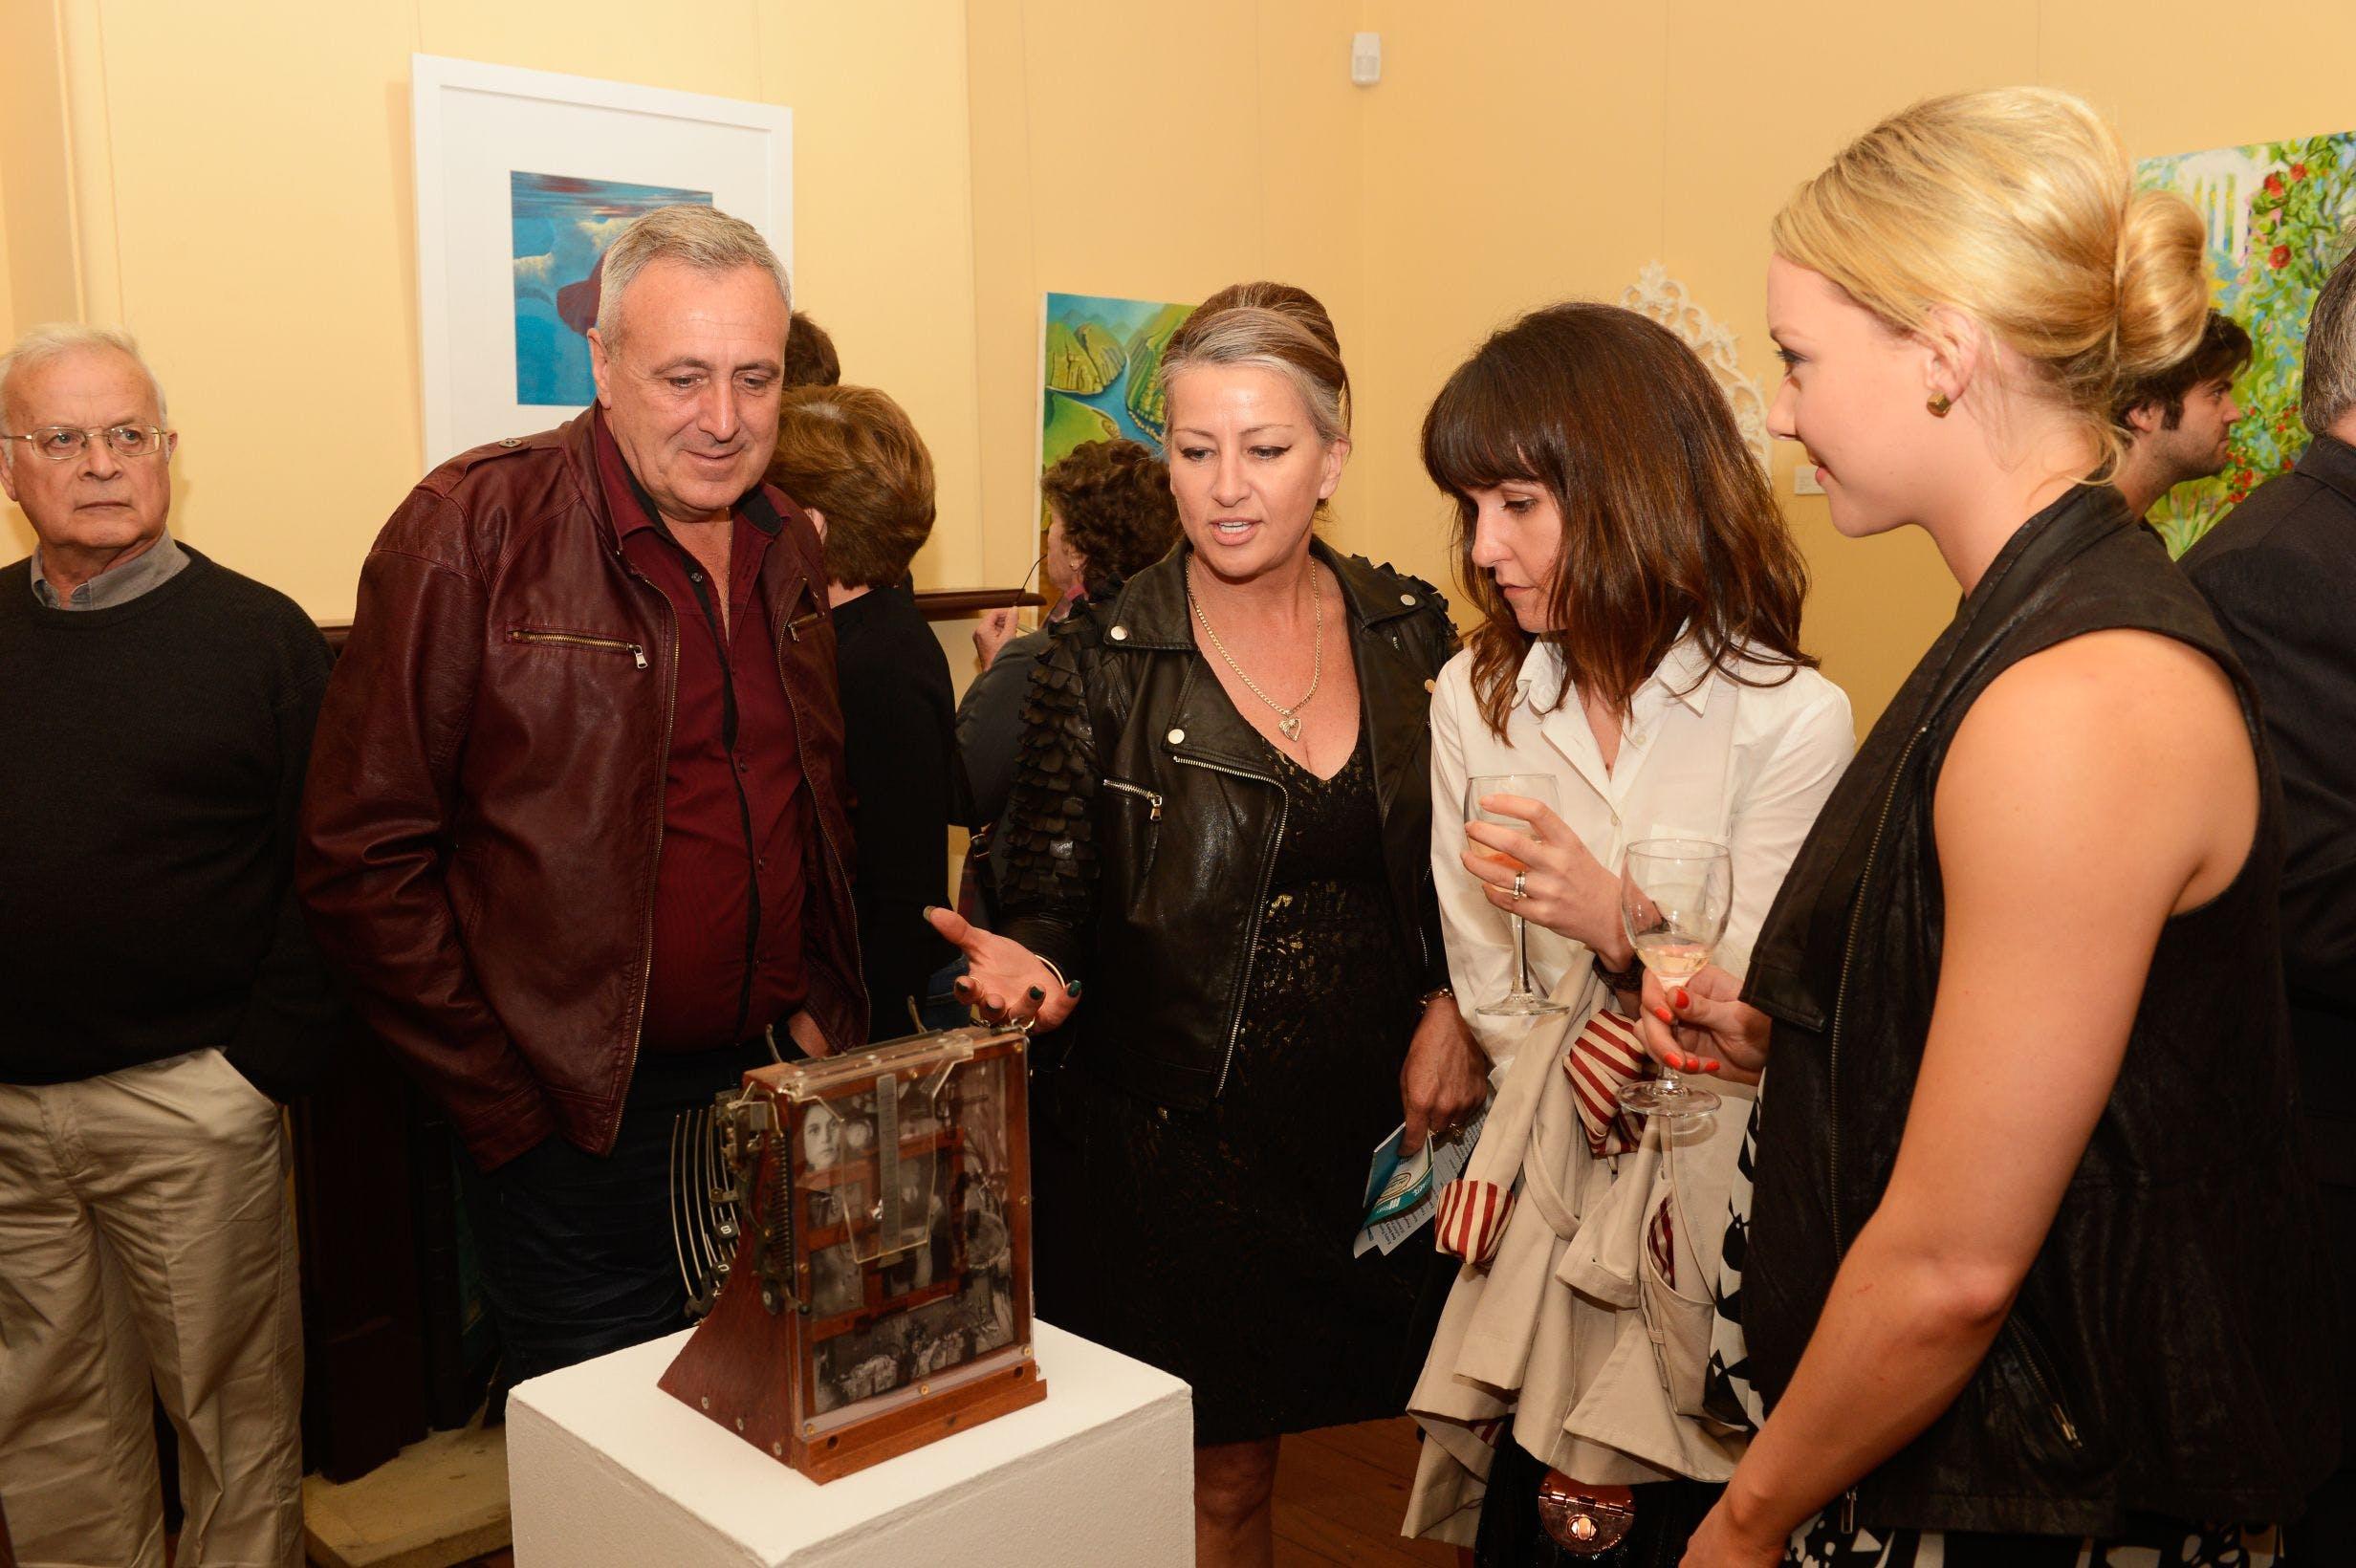 Edward Millen House hosts the Victoria Park Arts Season